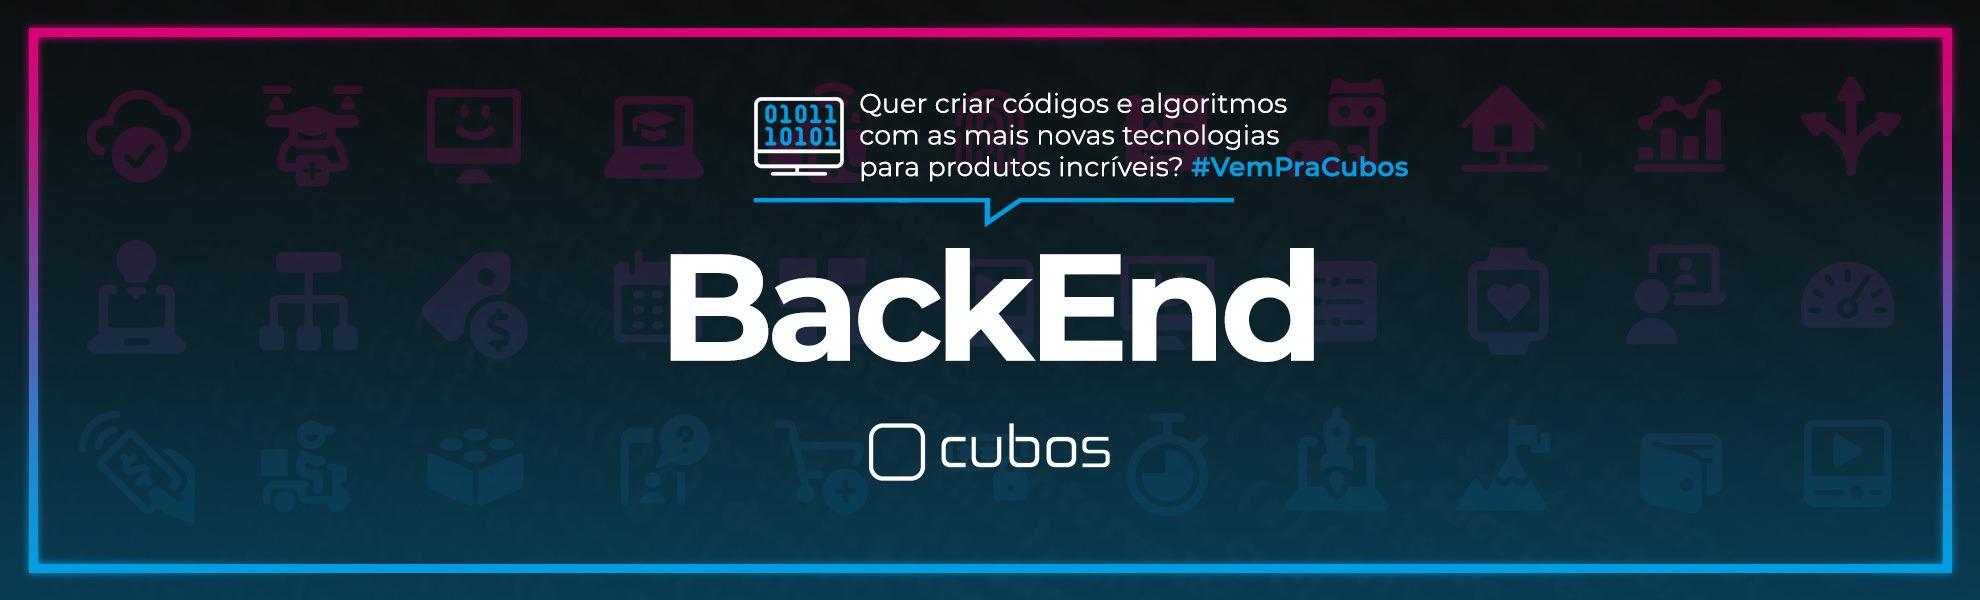 [ACADEMY] Desenvolvedor(a) Instrutor(a) Back-end